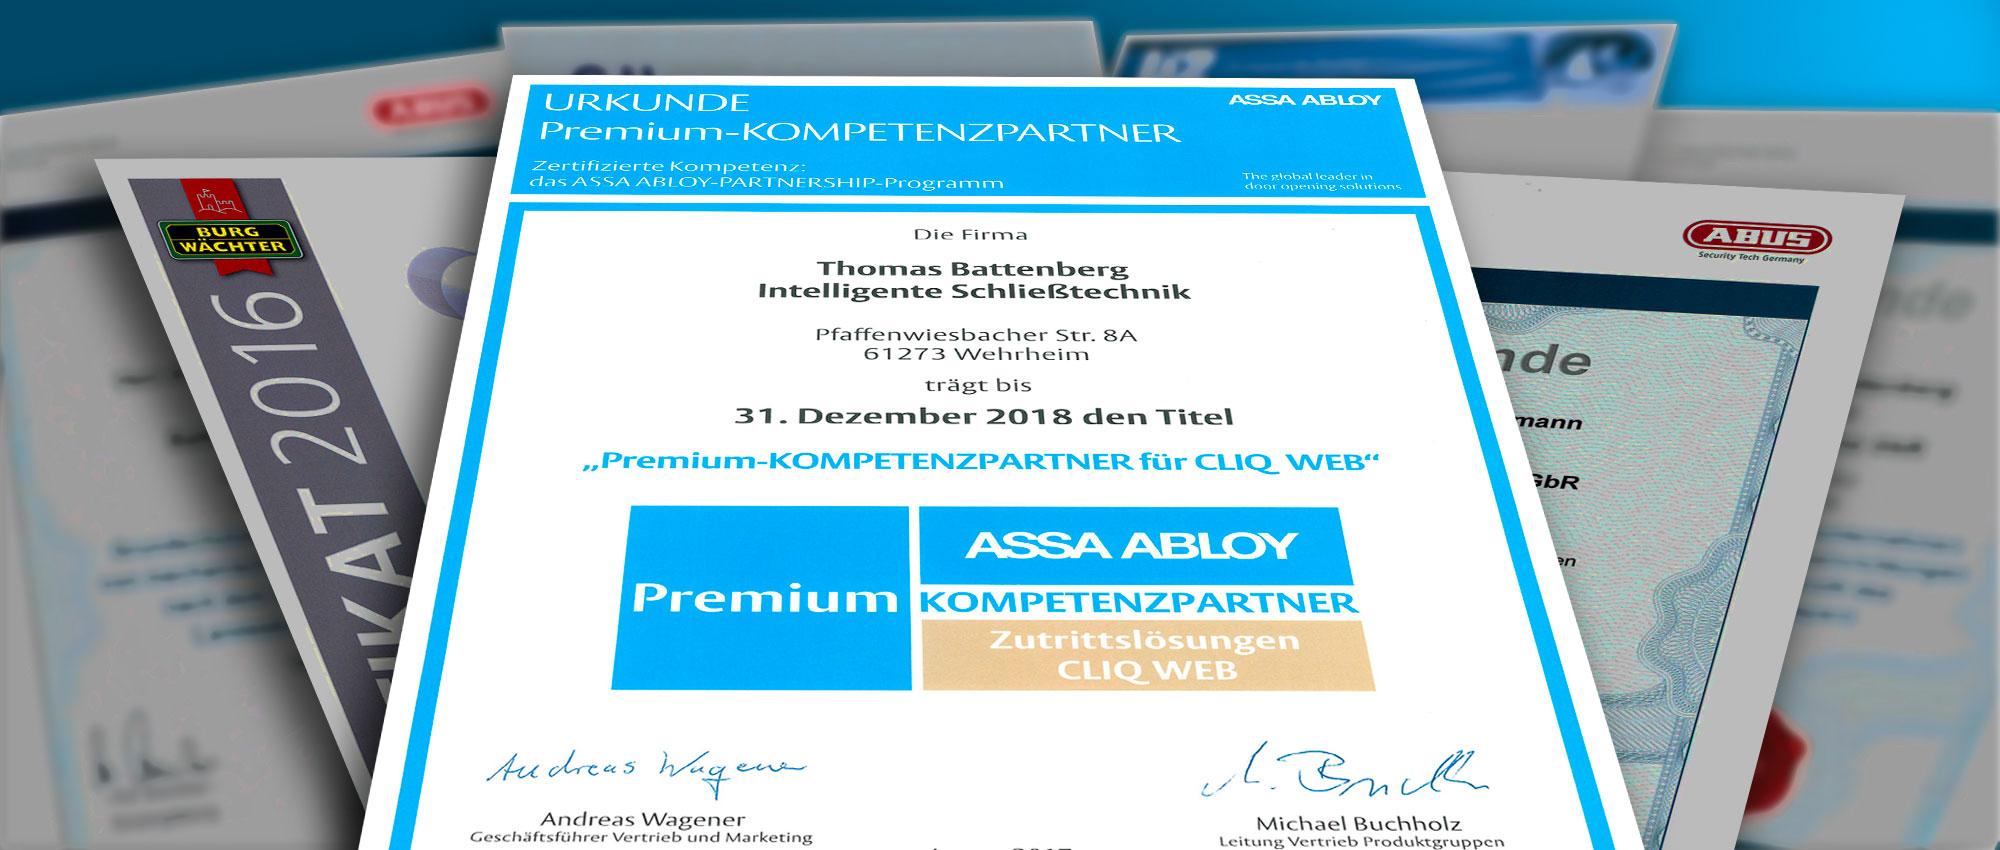 zertifikate-01-17